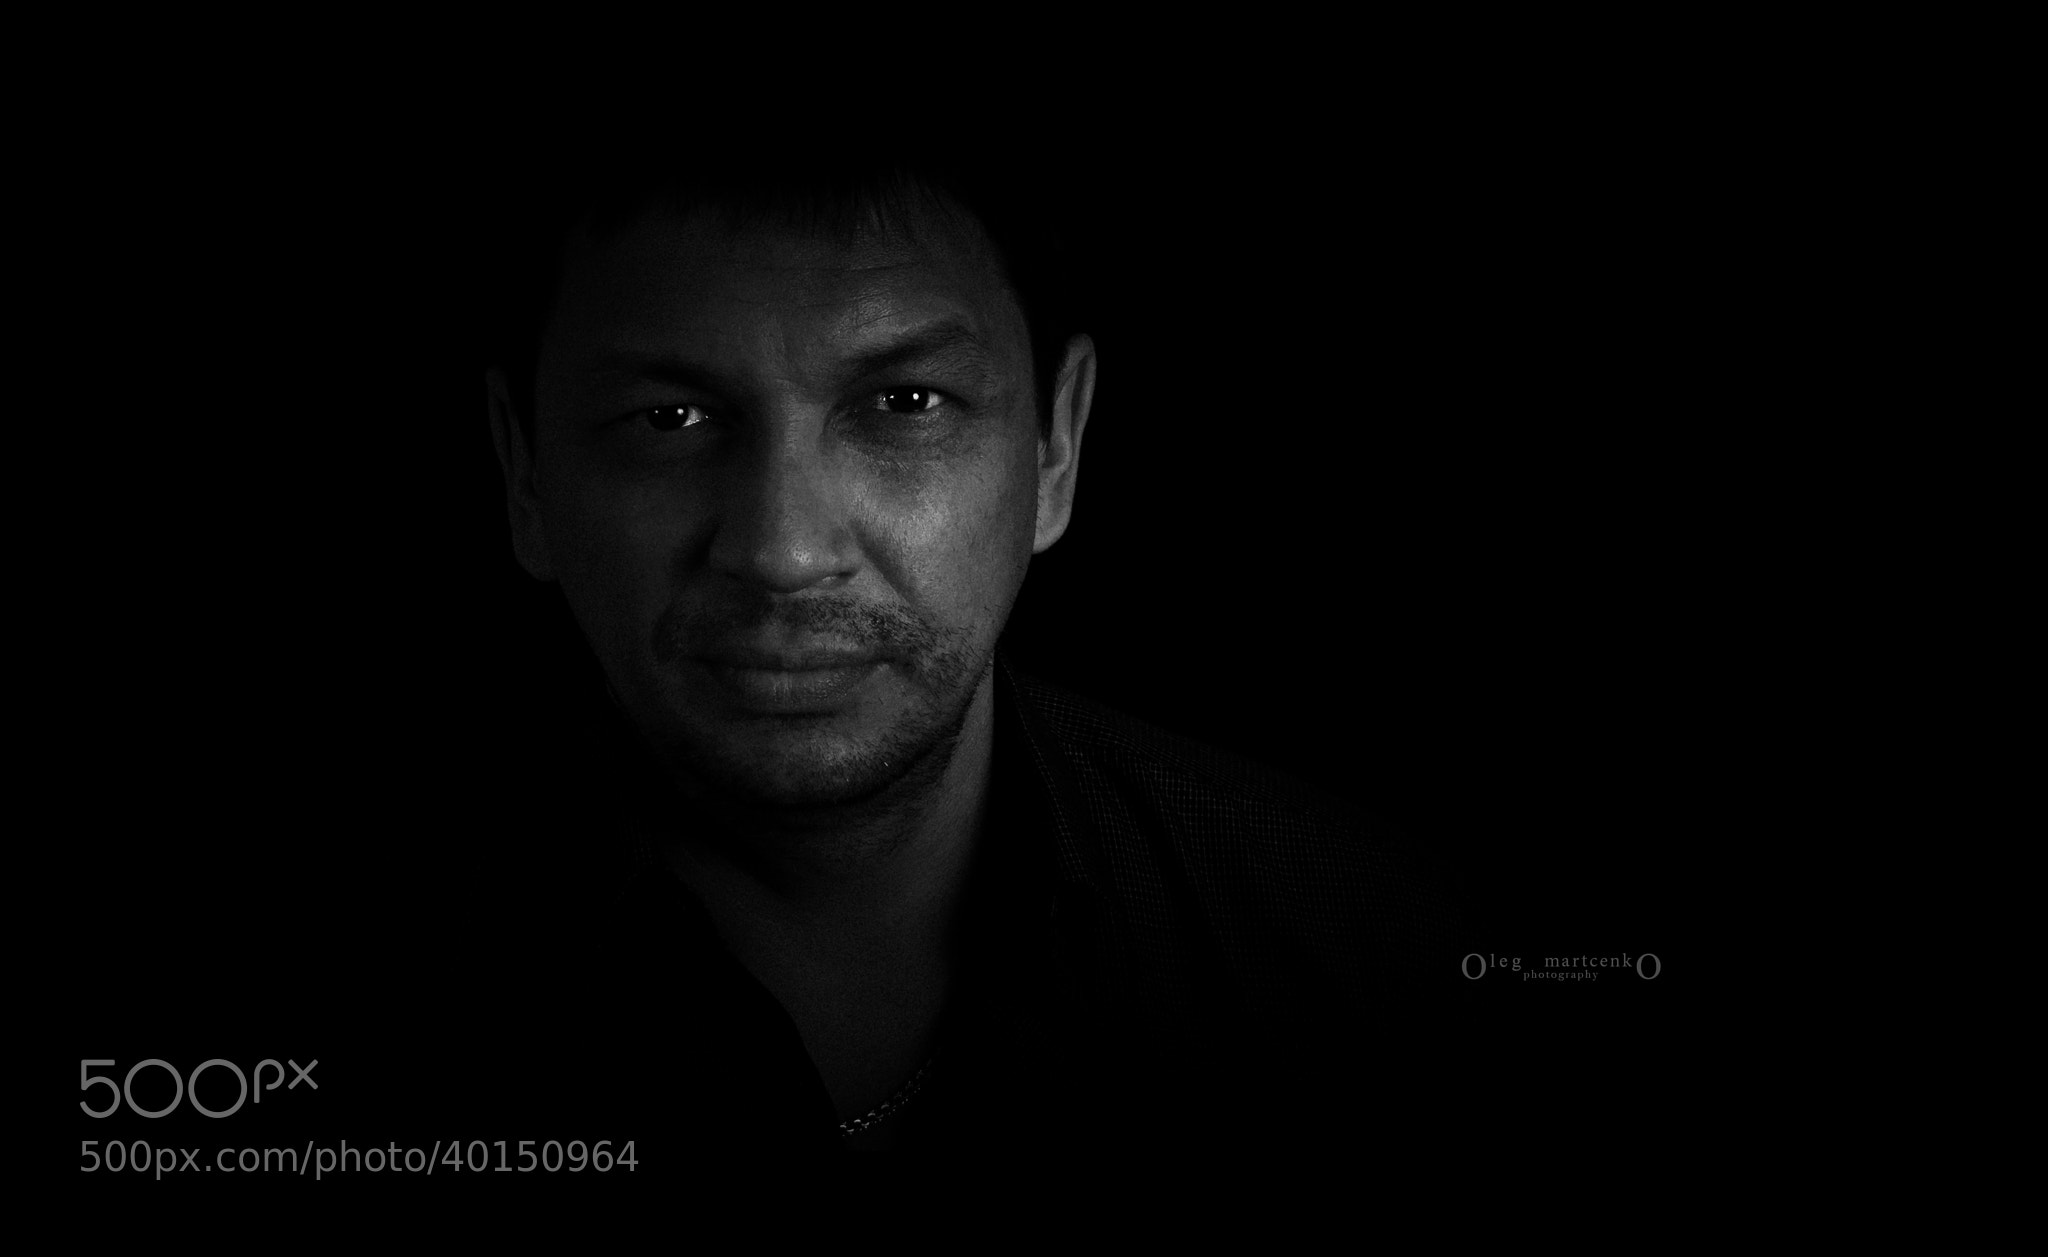 Photograph self-portrait by Oleg Martcenko on 500px